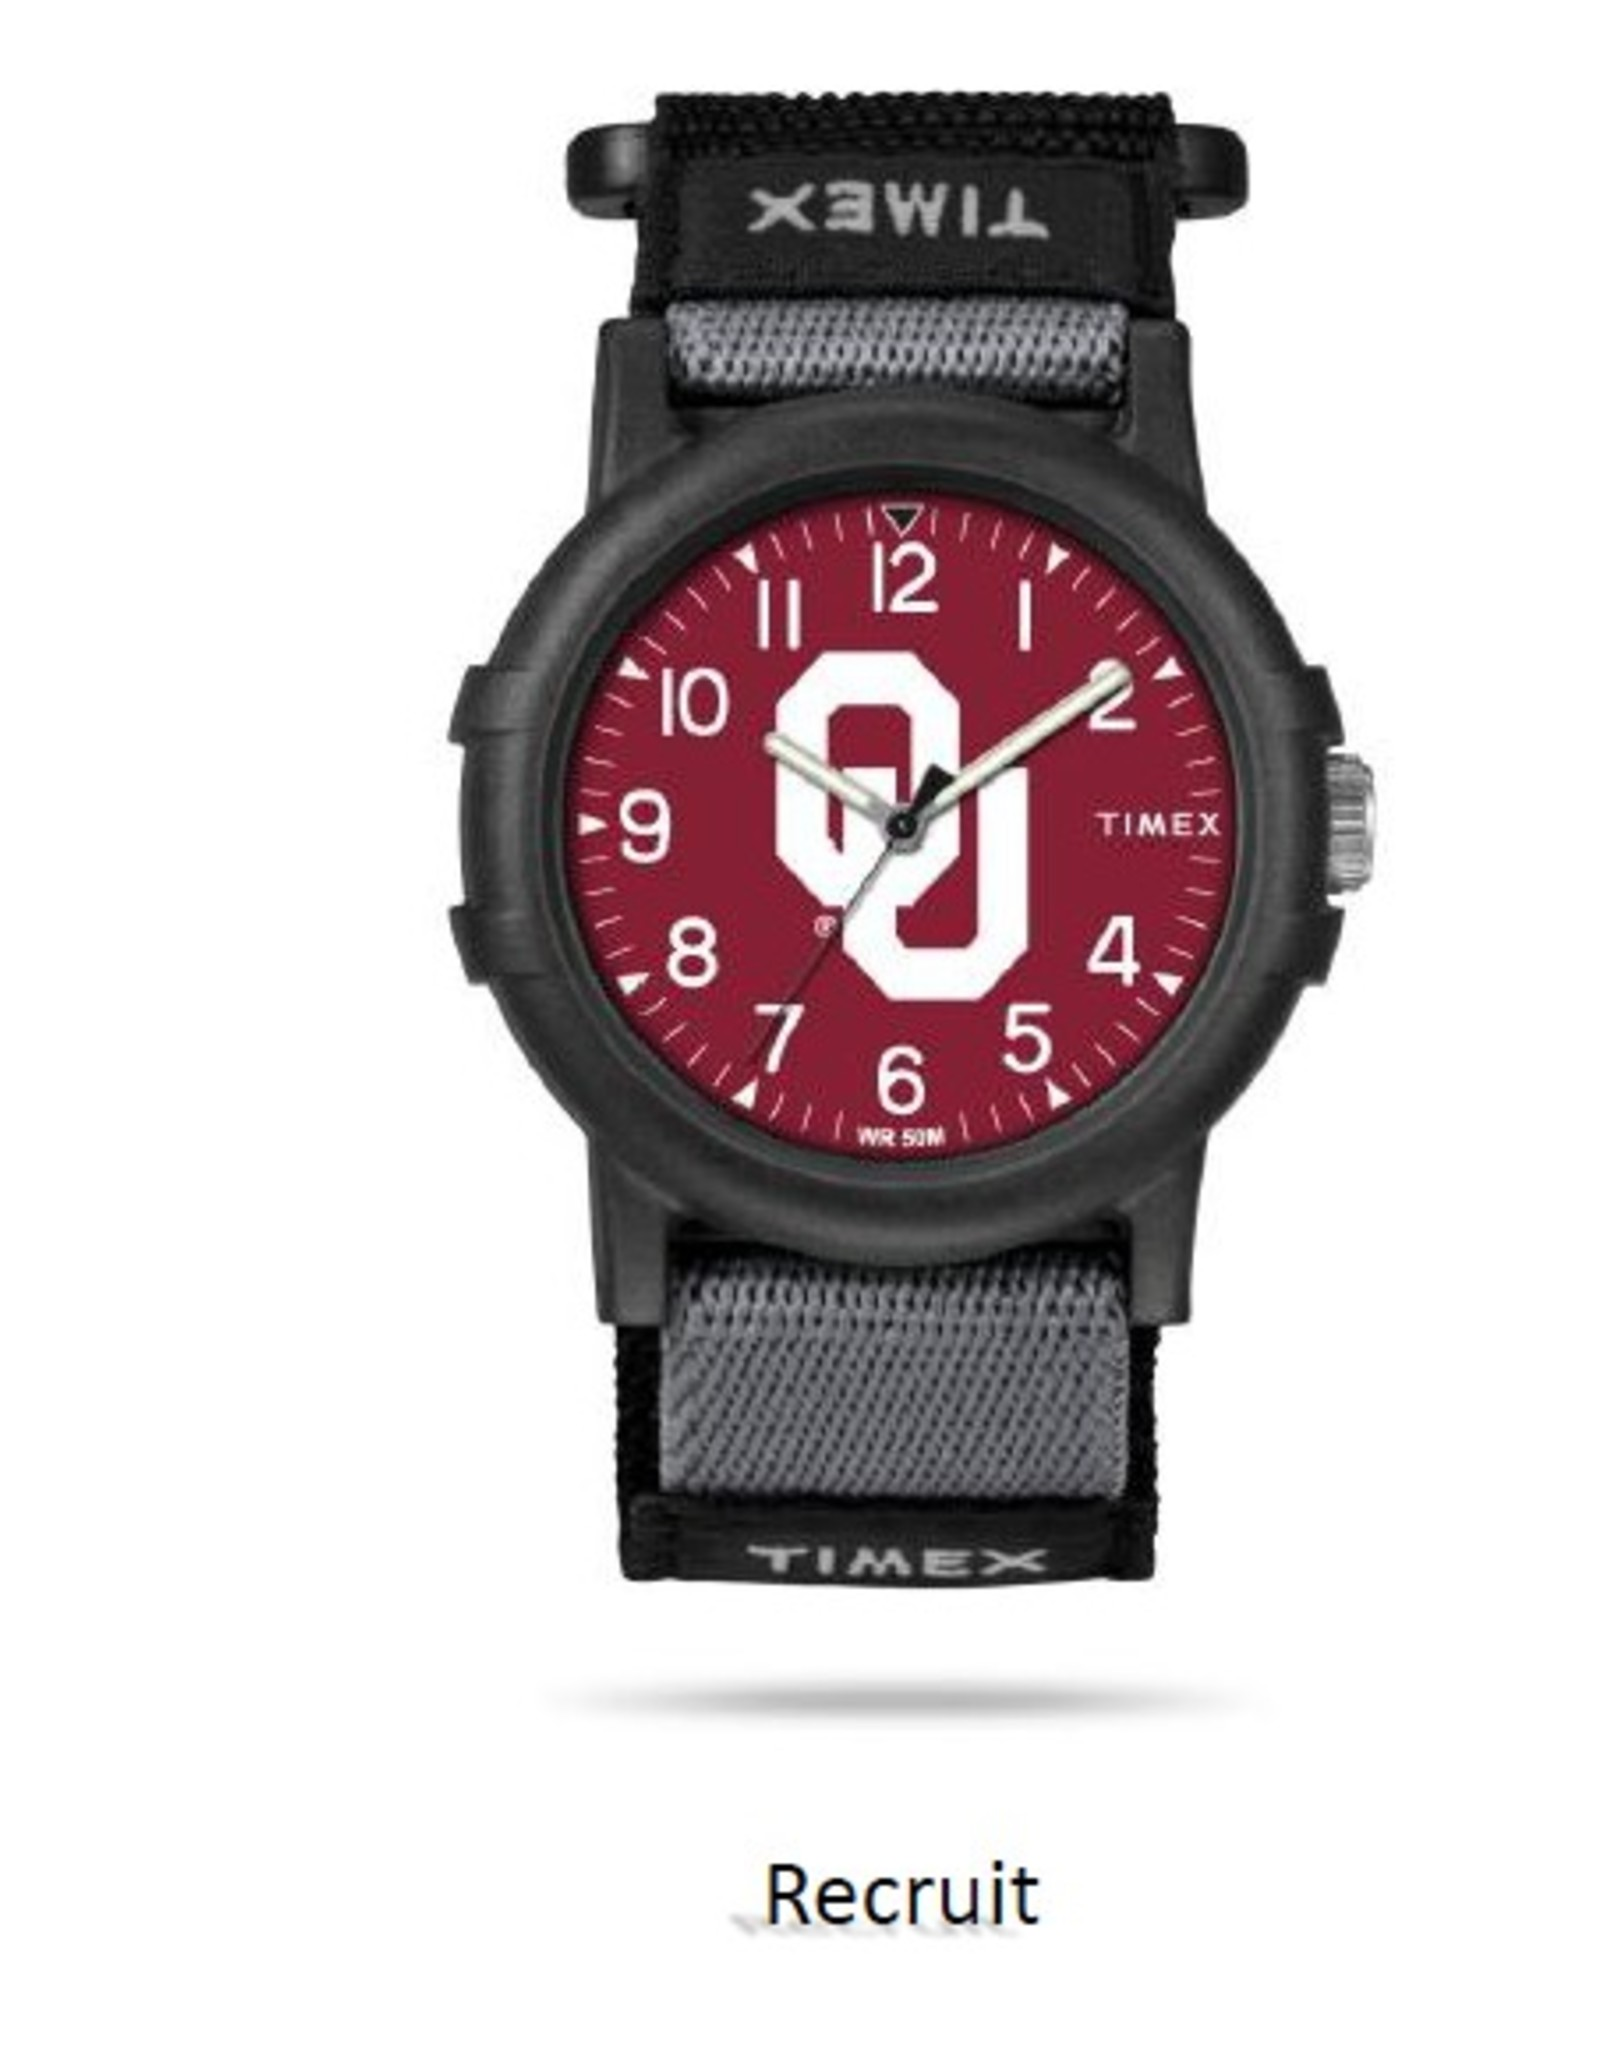 Timex OU Timex Recruit Youth Watch